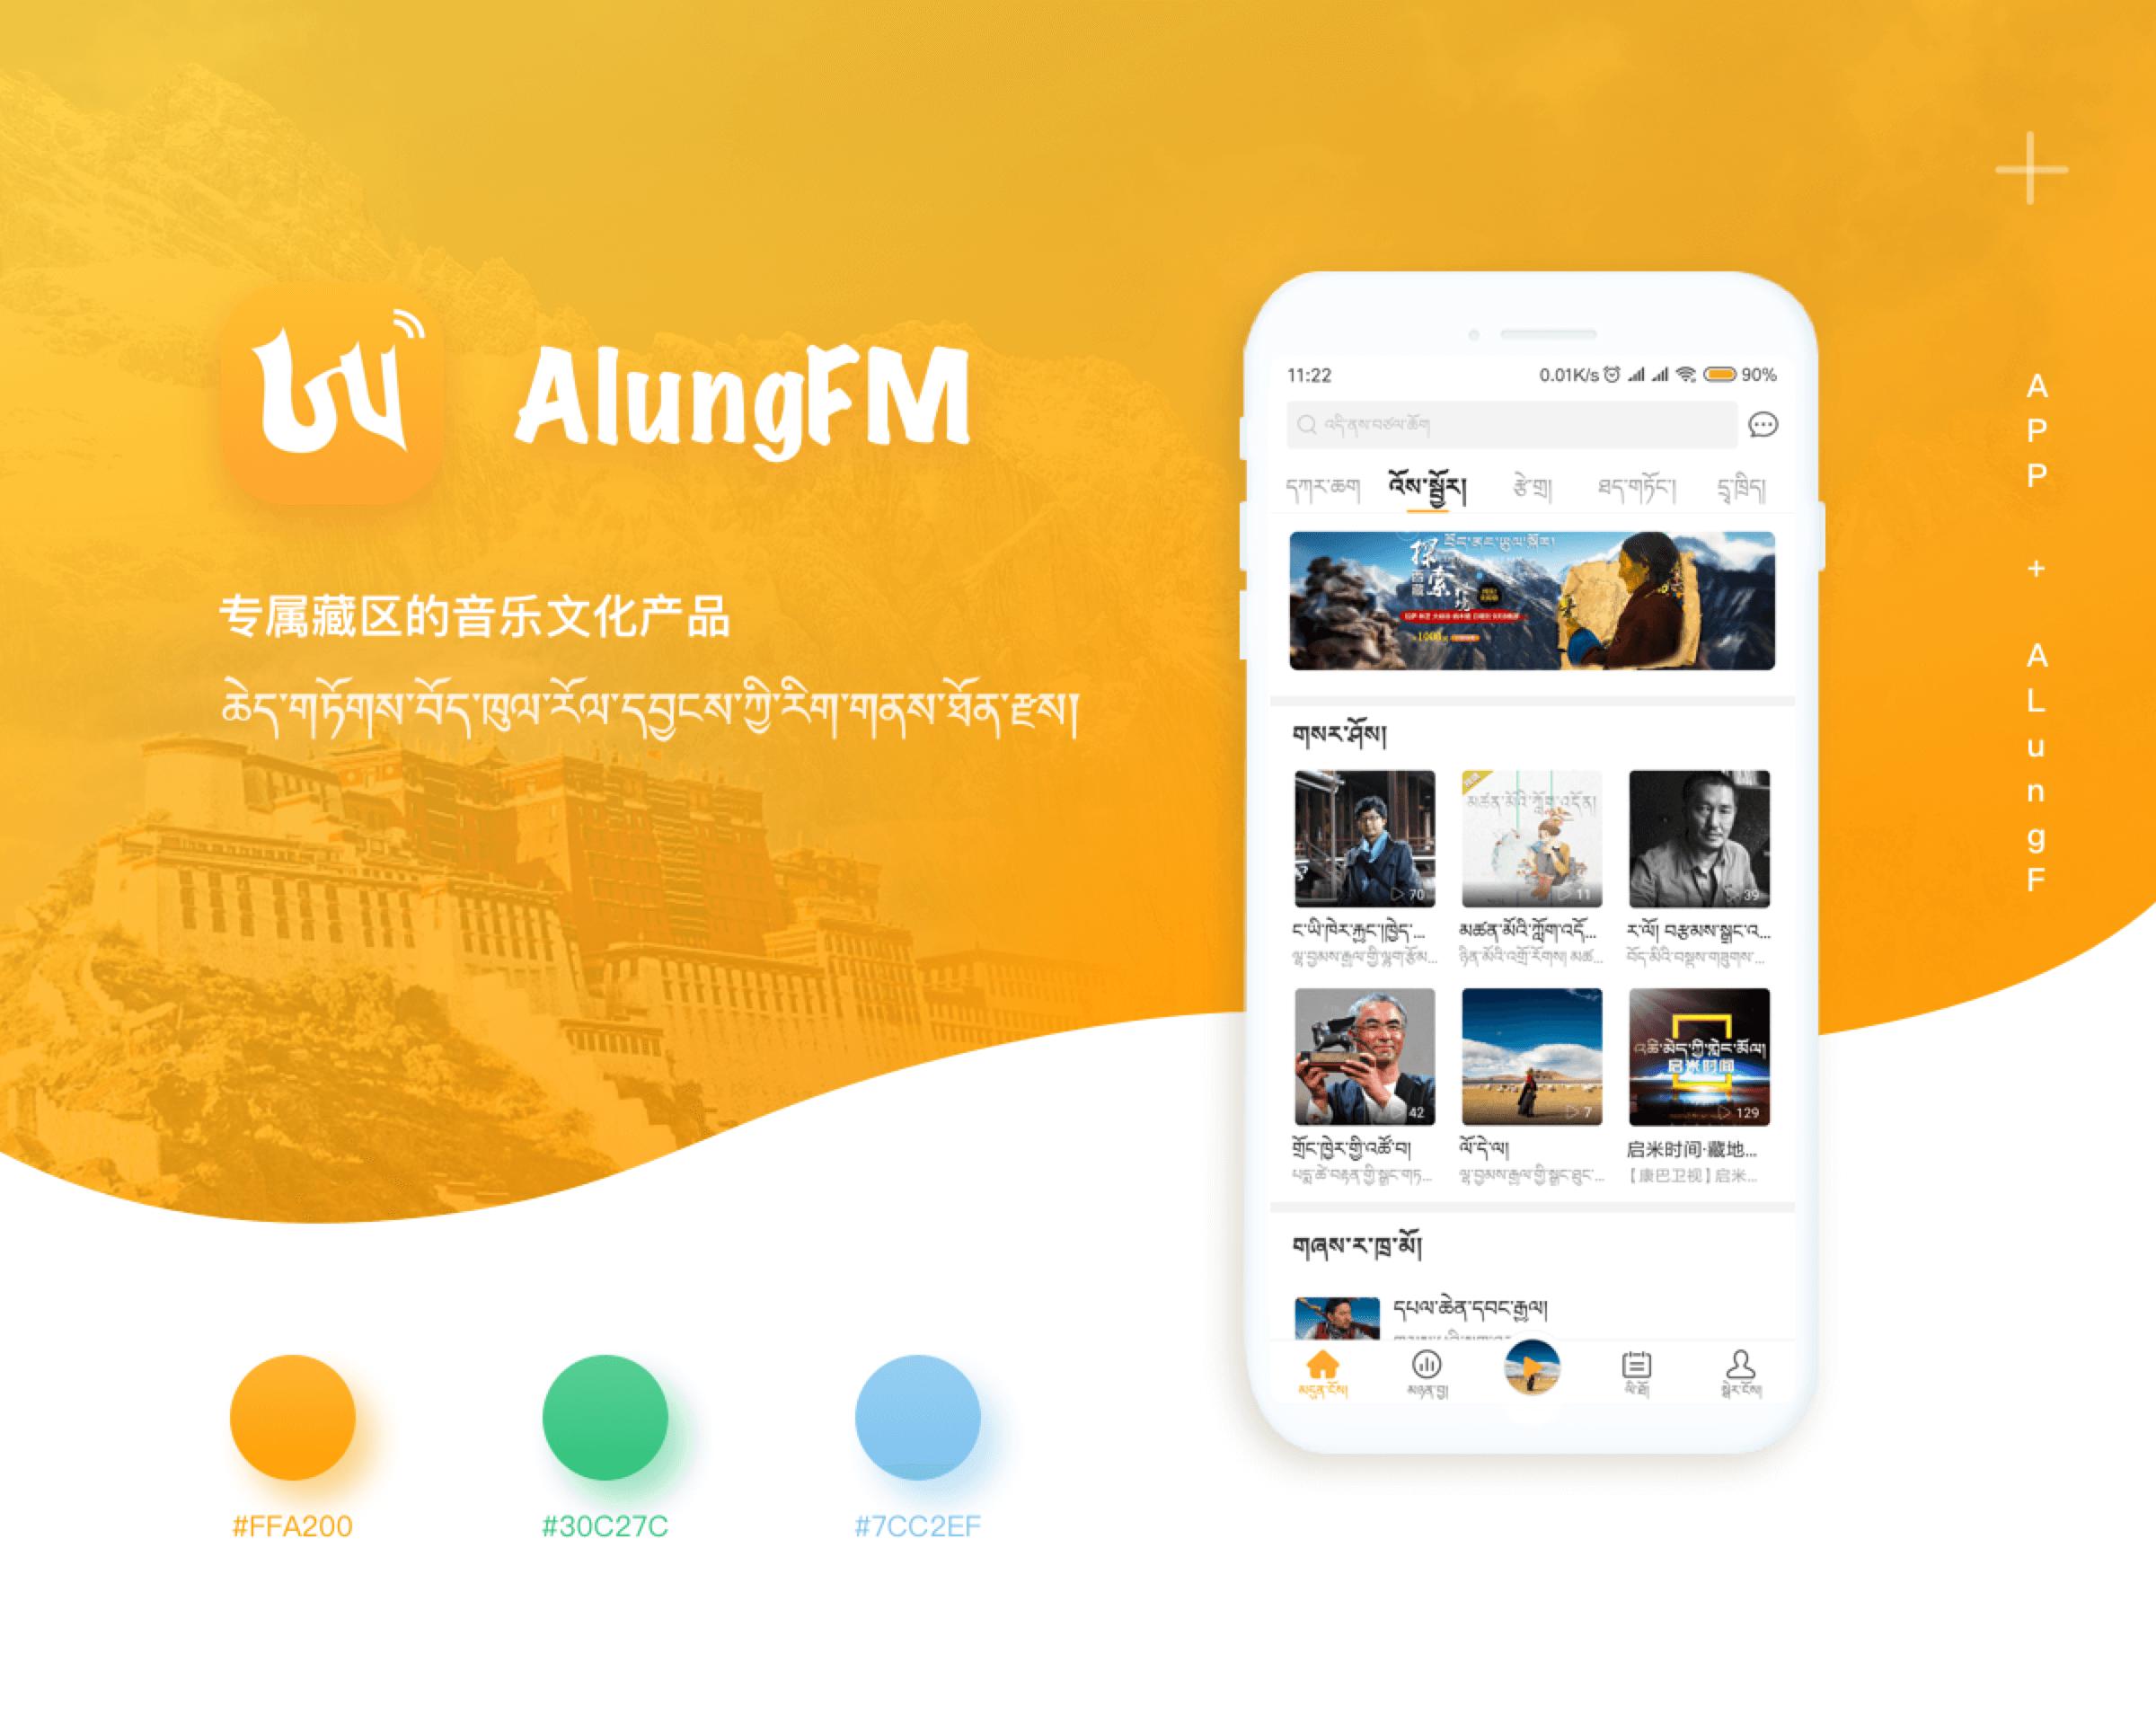 AlungFM 藏区音乐APP